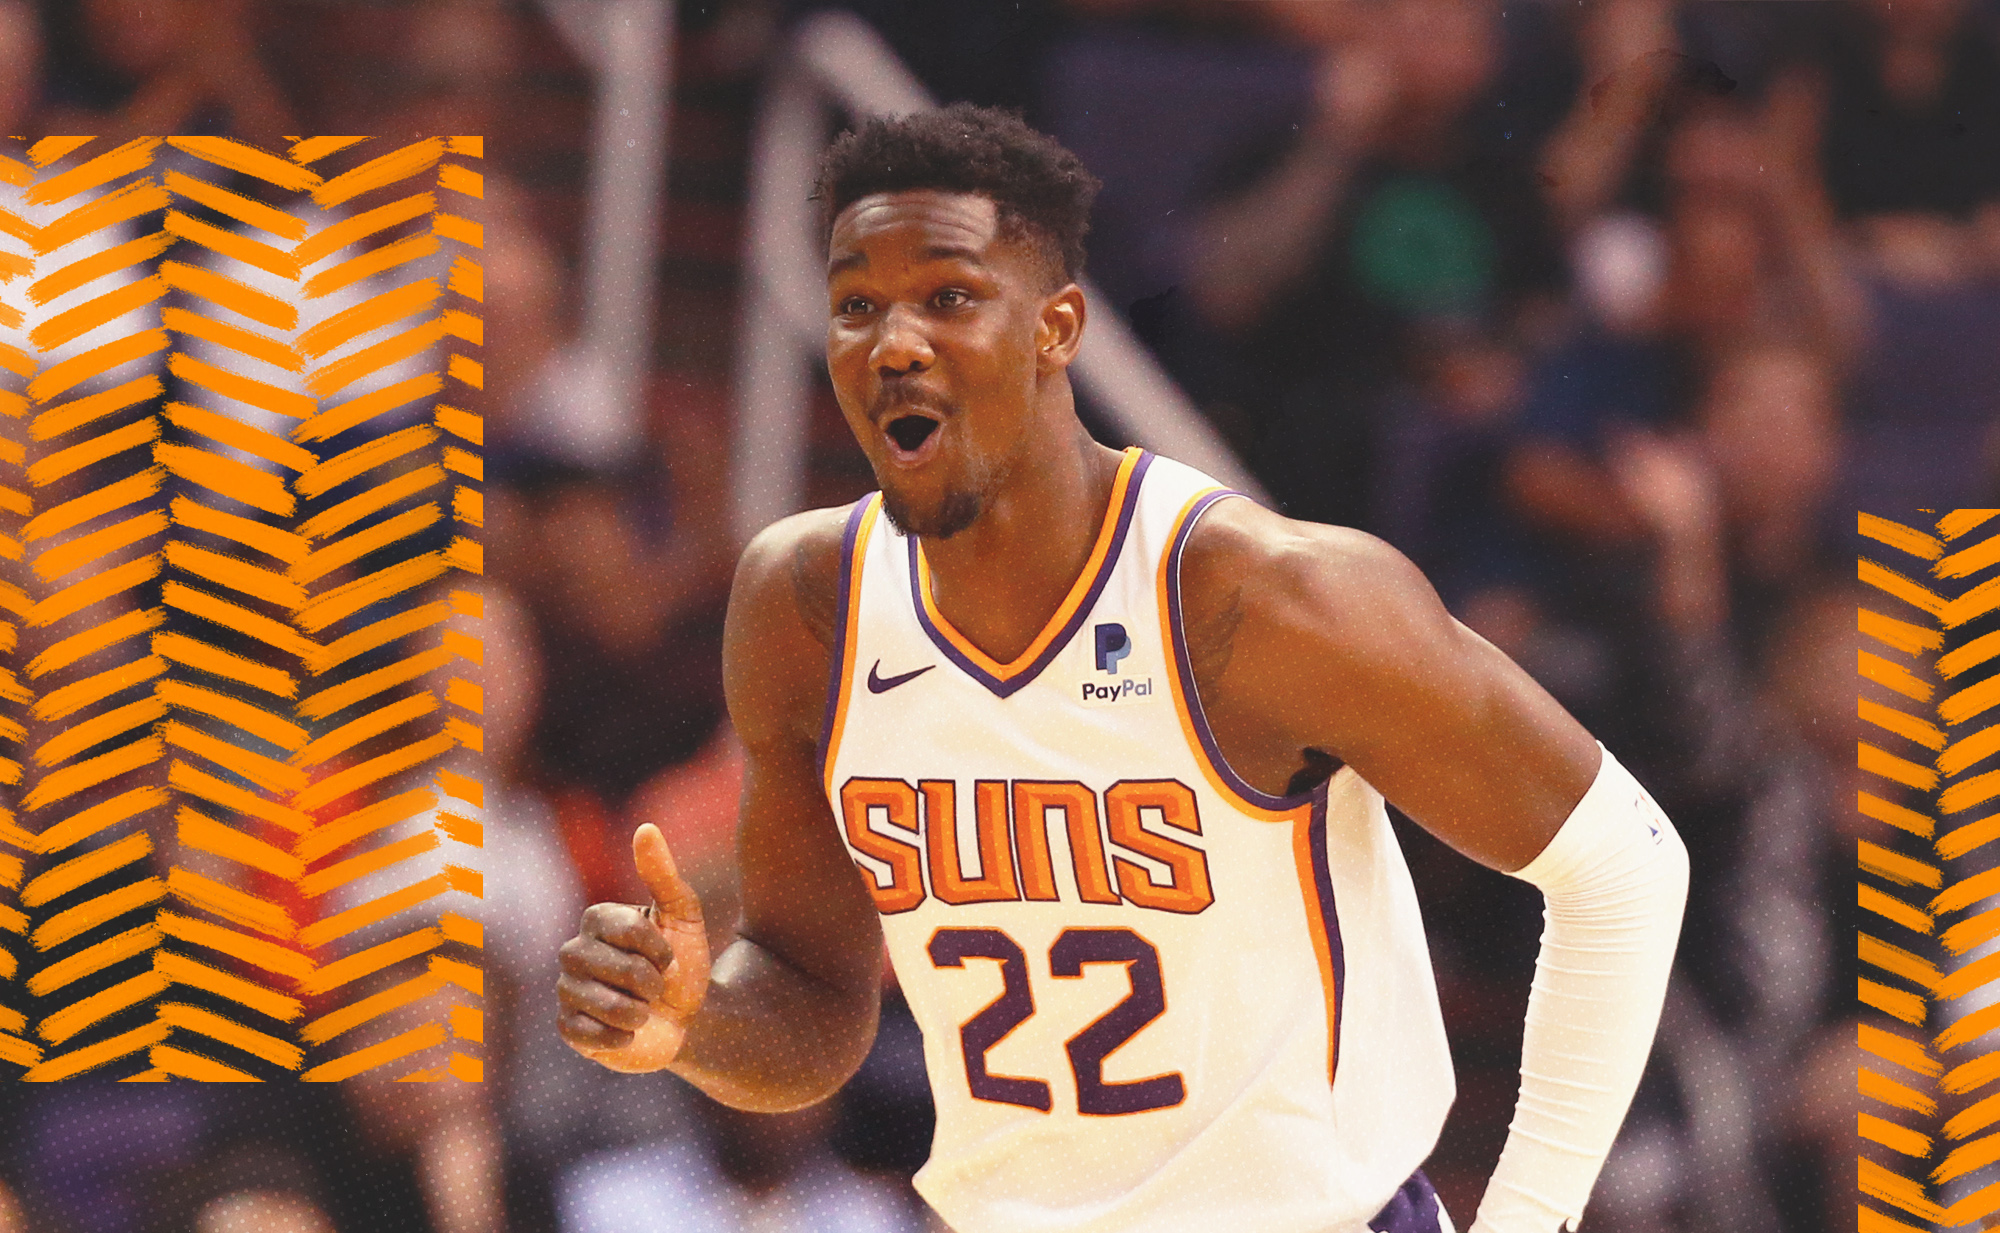 Deandre Ayton smiles as he runs down the court for the Phoenix Suns.